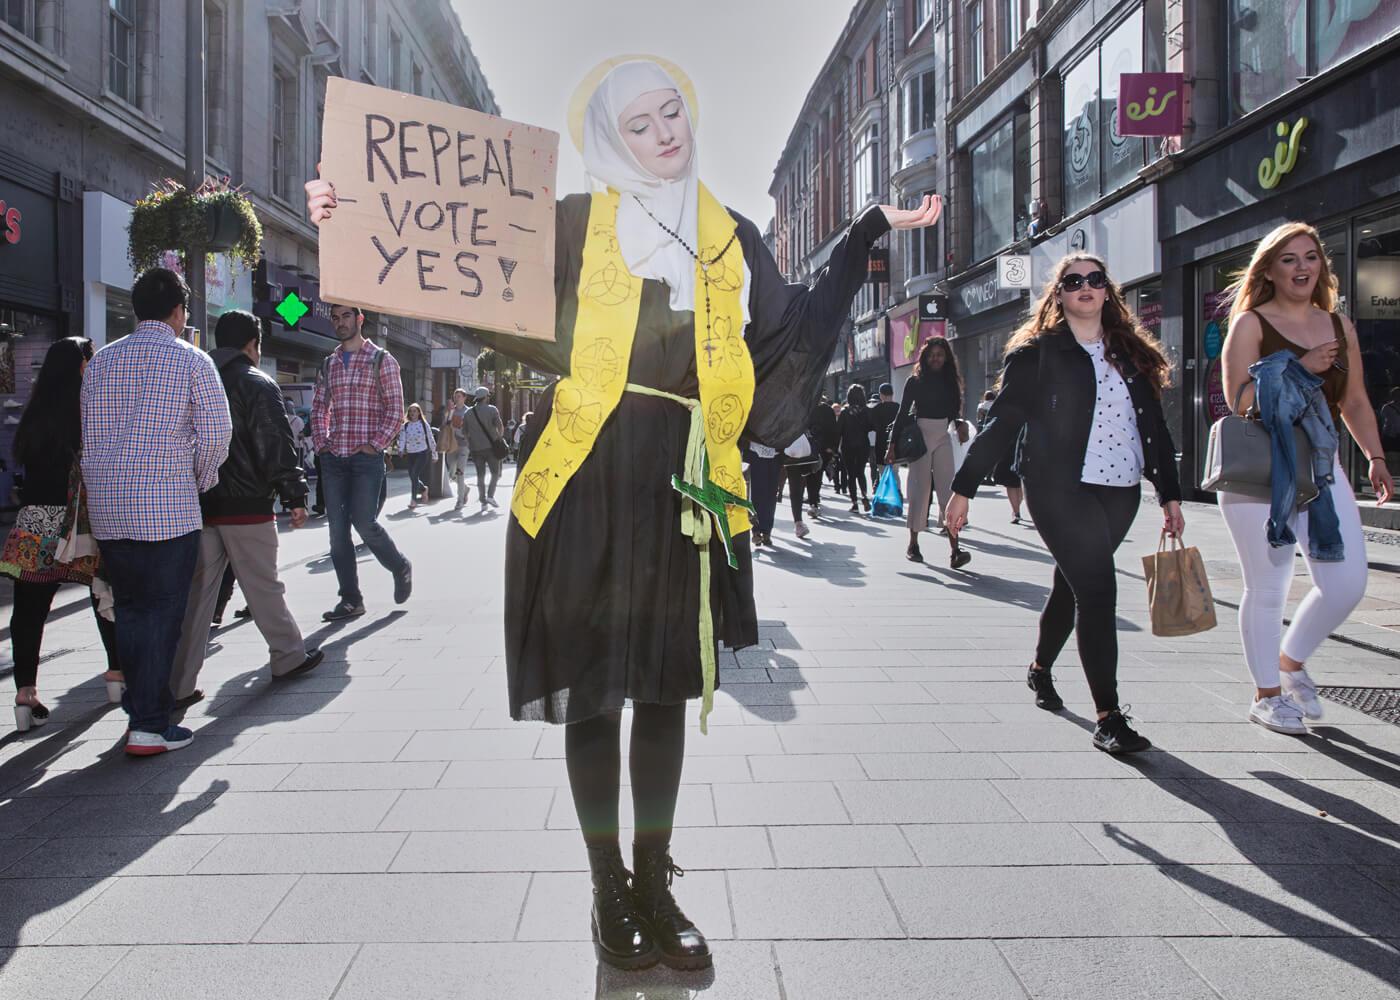 Saint Brigid, Dublin.  Repeal campaigner Megan Scott dressed as Saint Brigid, Ireland's female patron saint, on Dublin's main shopping street. Saint Brigid's miracle was to cause pregnancy to vanish. It is thought modern Catholic scholars suppressed this part of Saint Brigid's story.